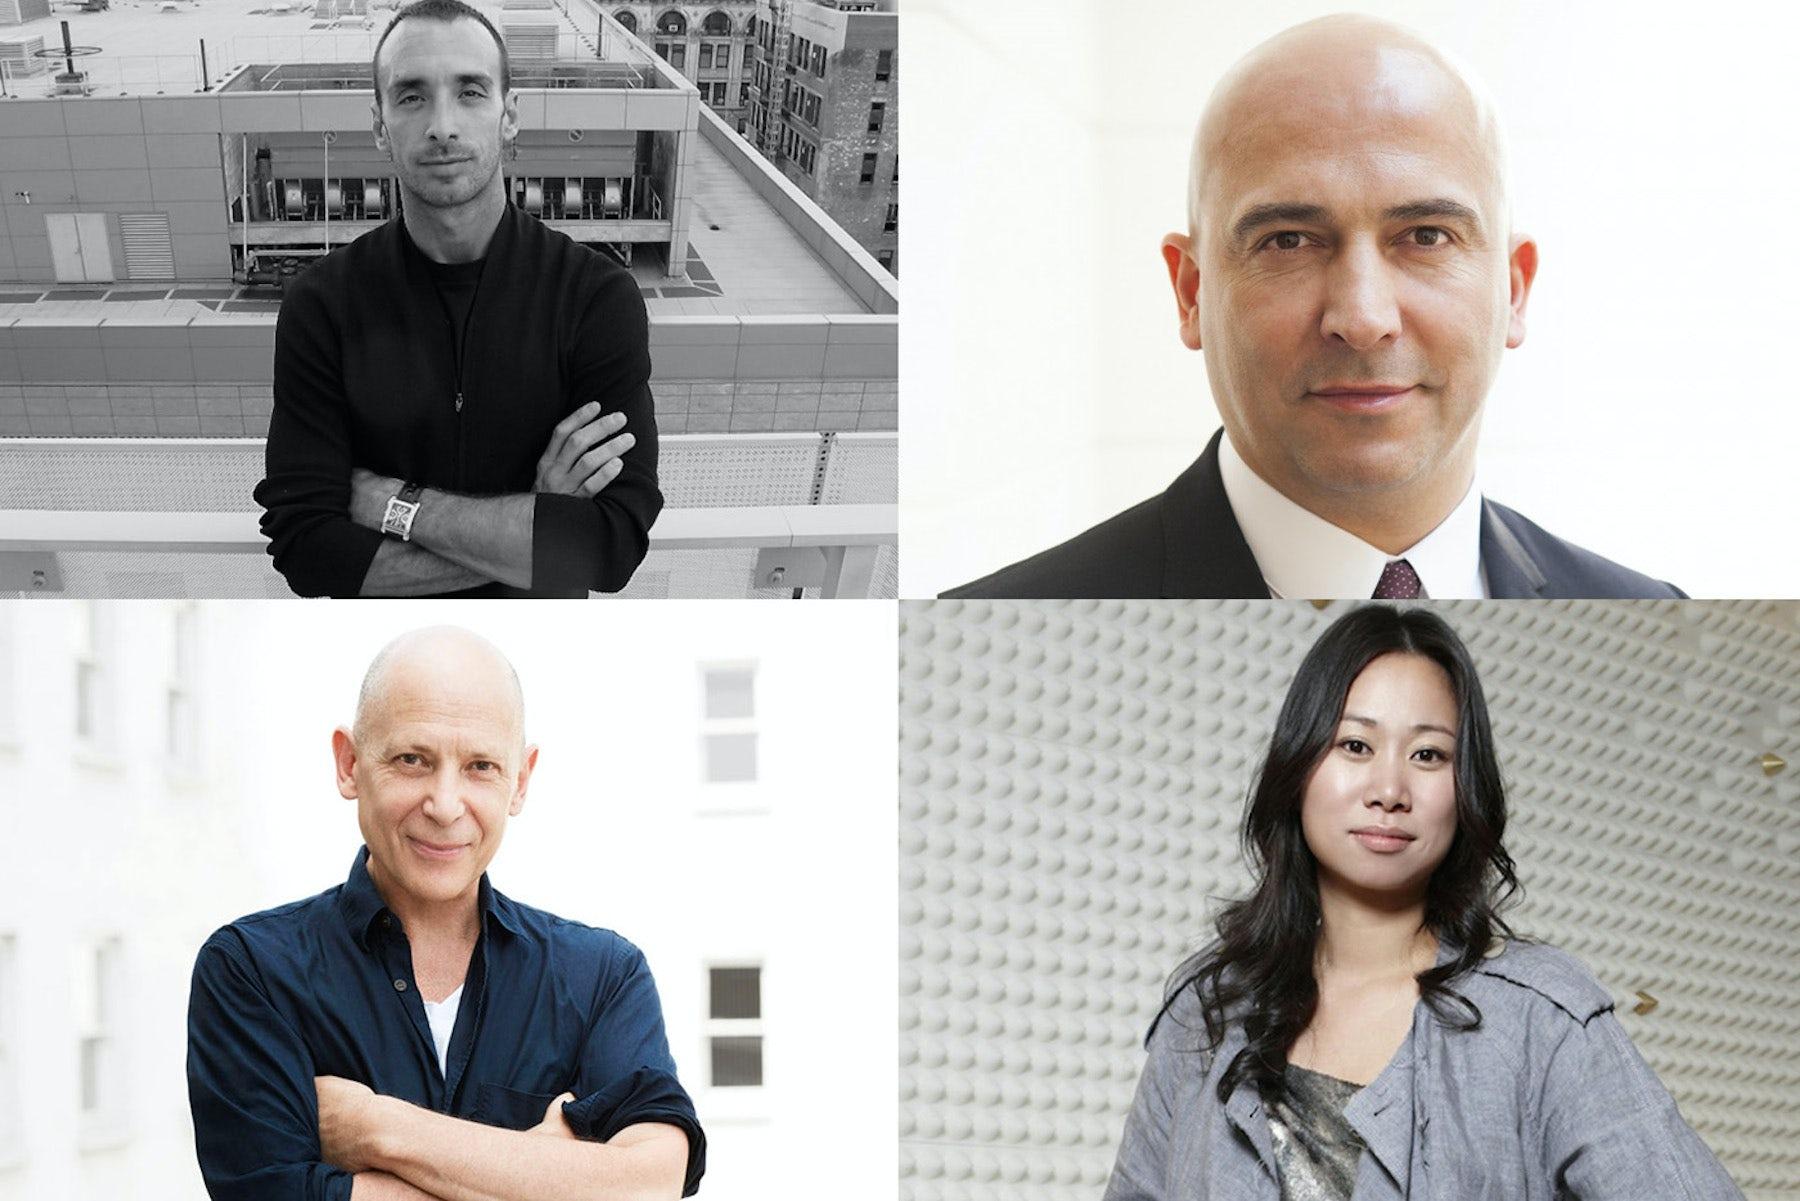 (Clockwise from top left) Rodrigo Bazan, Fabrizio Cardinali, Wen Zhou and Adrian Joffe | Source: Courtesy